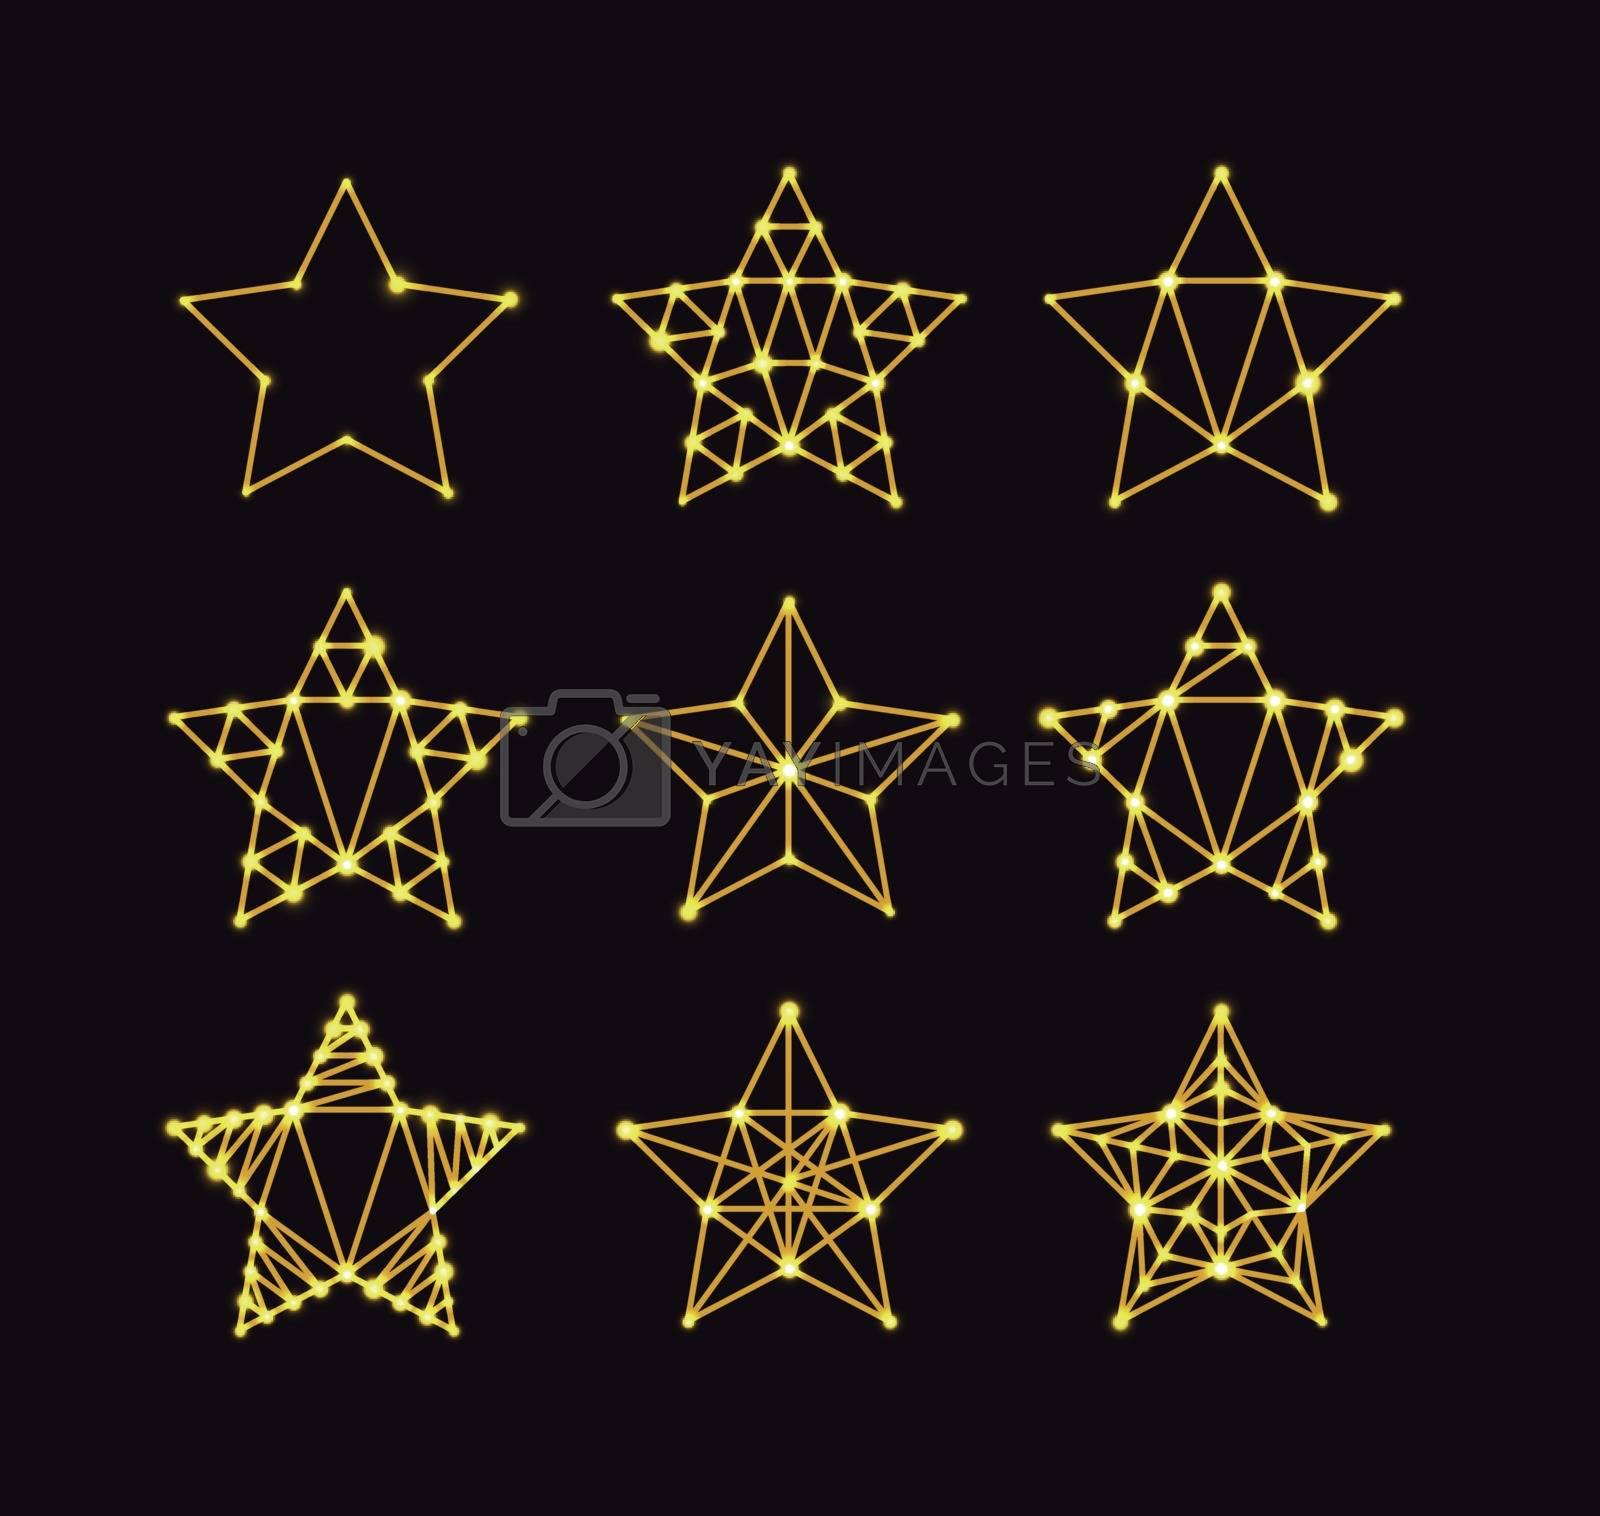 Golden geometric stars in the art deco style, varying degrees of detail. Modern design. Vector illustration on a dark background